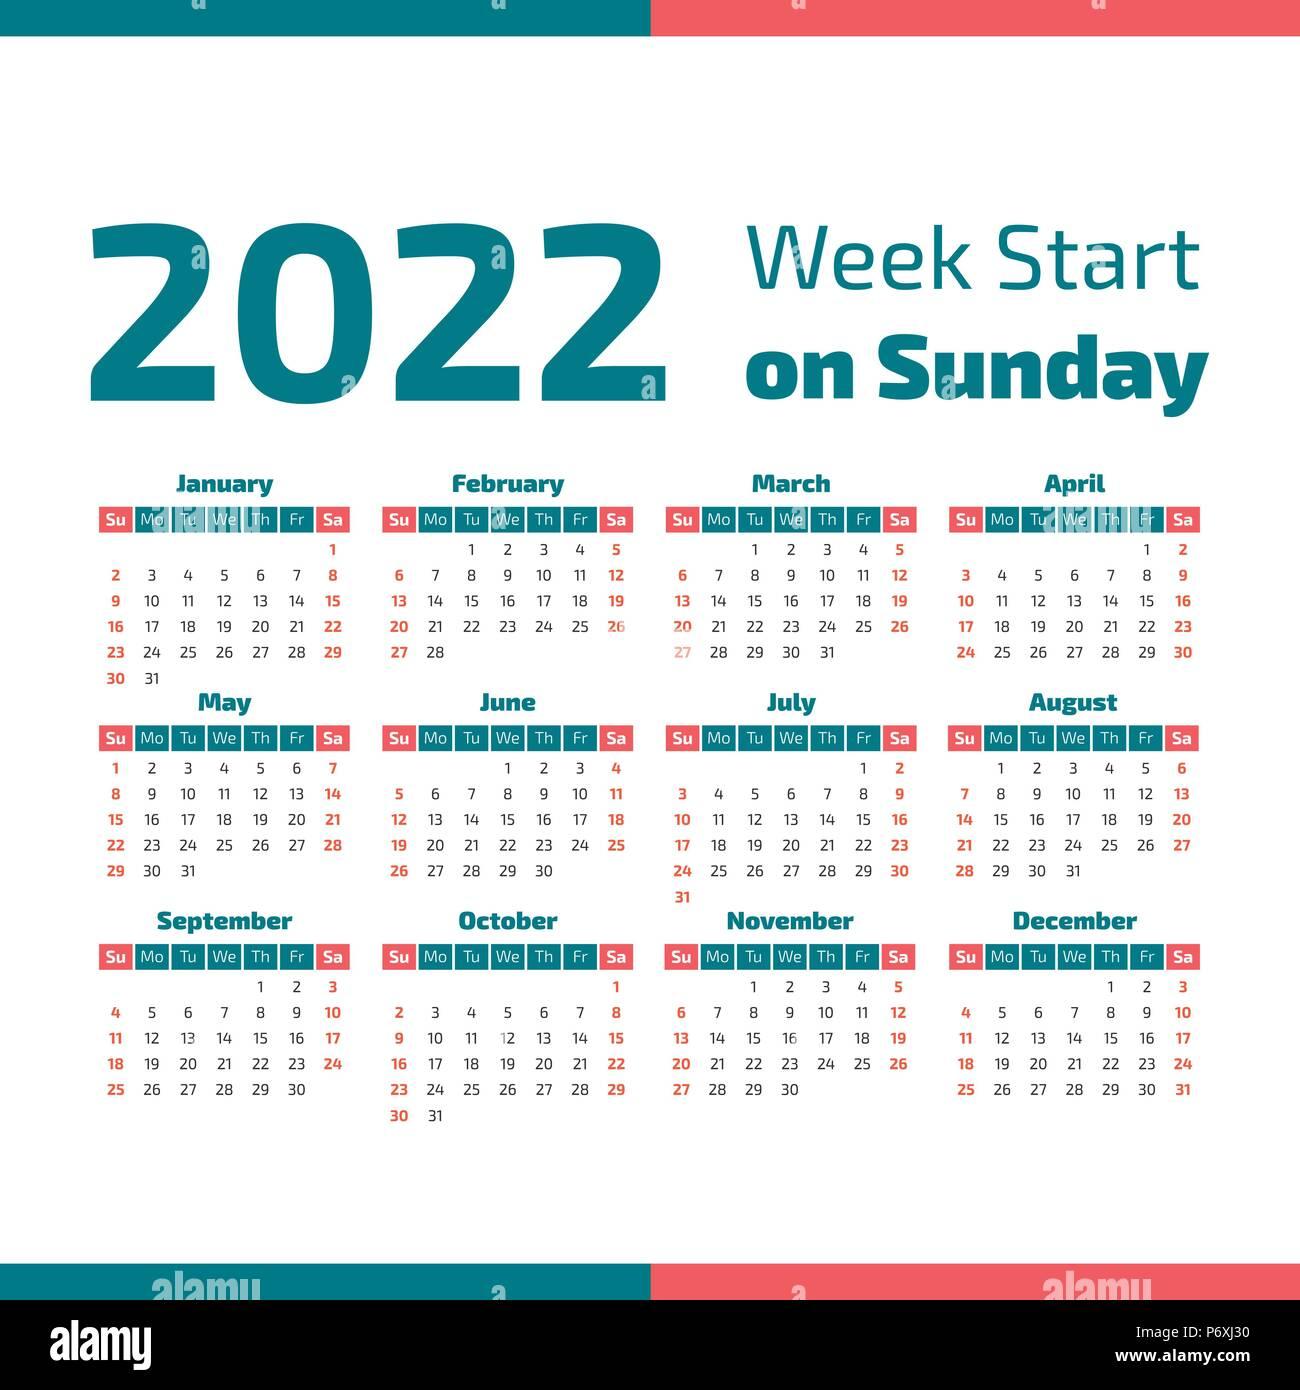 2022 Calendar With Weeks.Simple 2022 Year Calendar Week Starts On Sunday Stock Vector Image Art Alamy